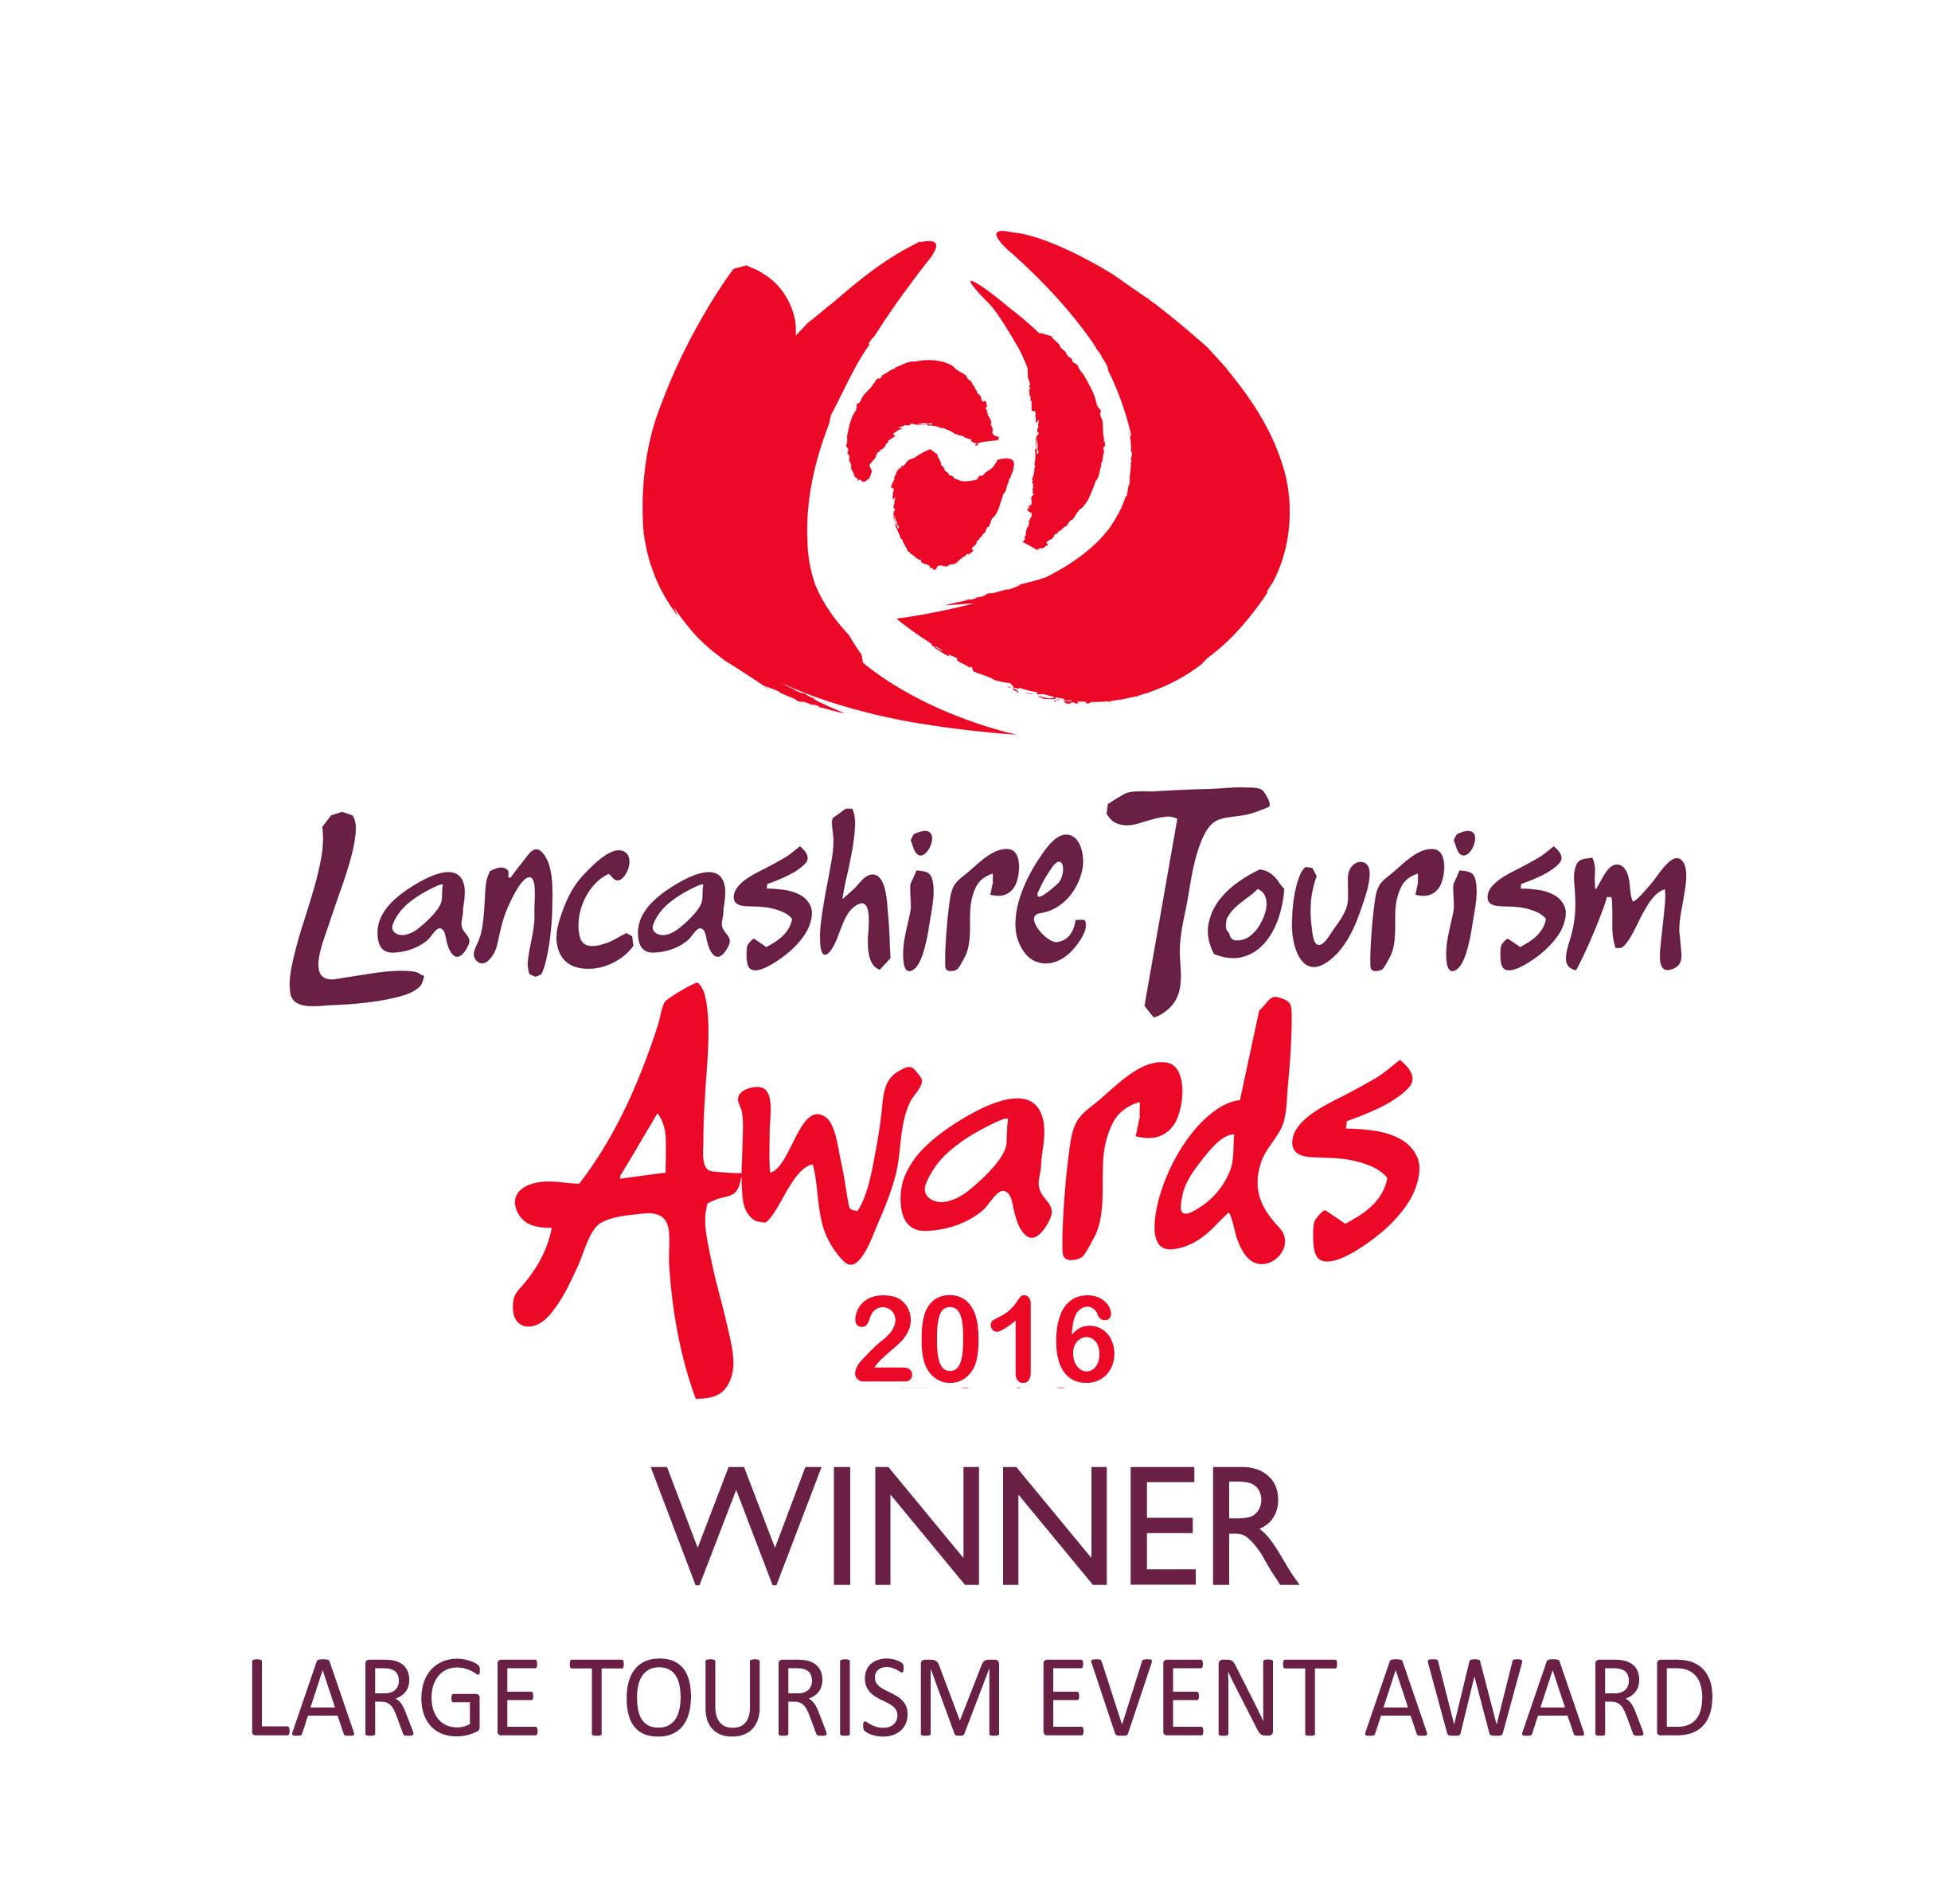 Lancashire Tourism Awards 2016  winners logo Large Tourism Event Award.jpg